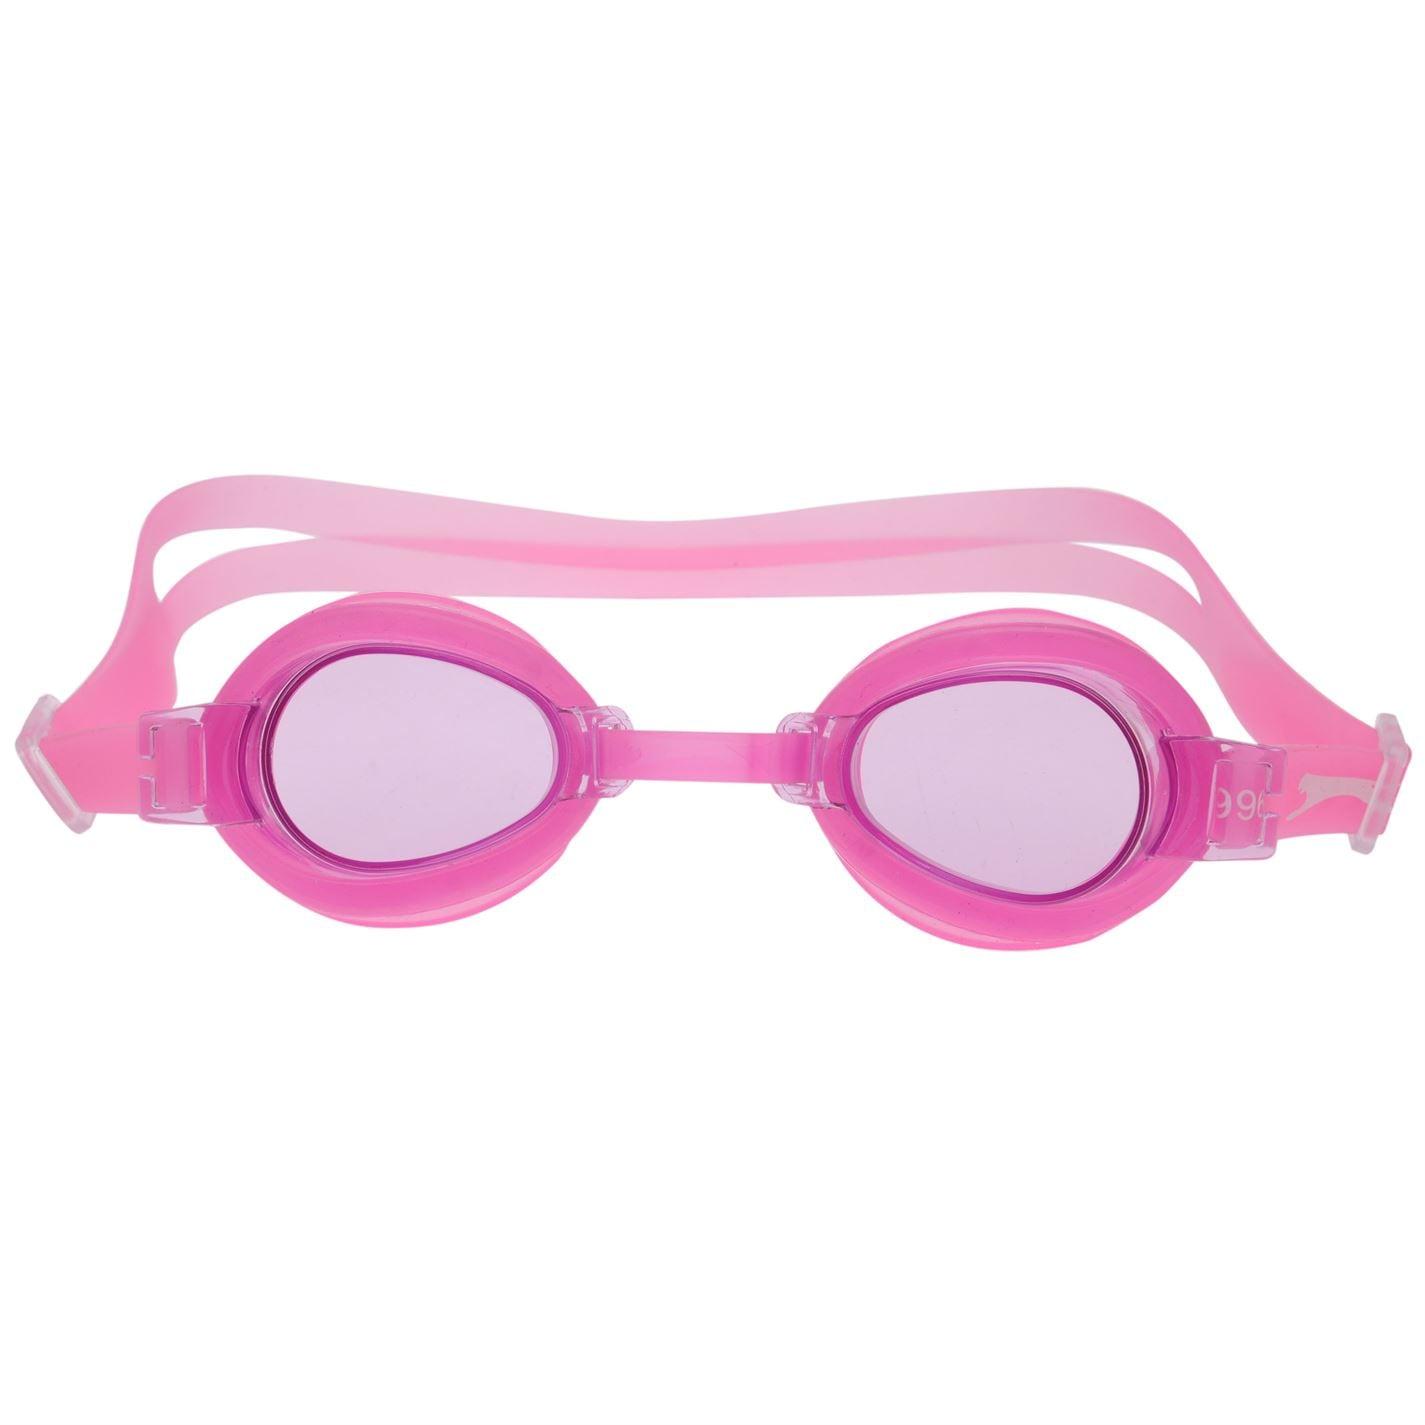 Slazenger Wave Swimming Goggles Juniors Pink